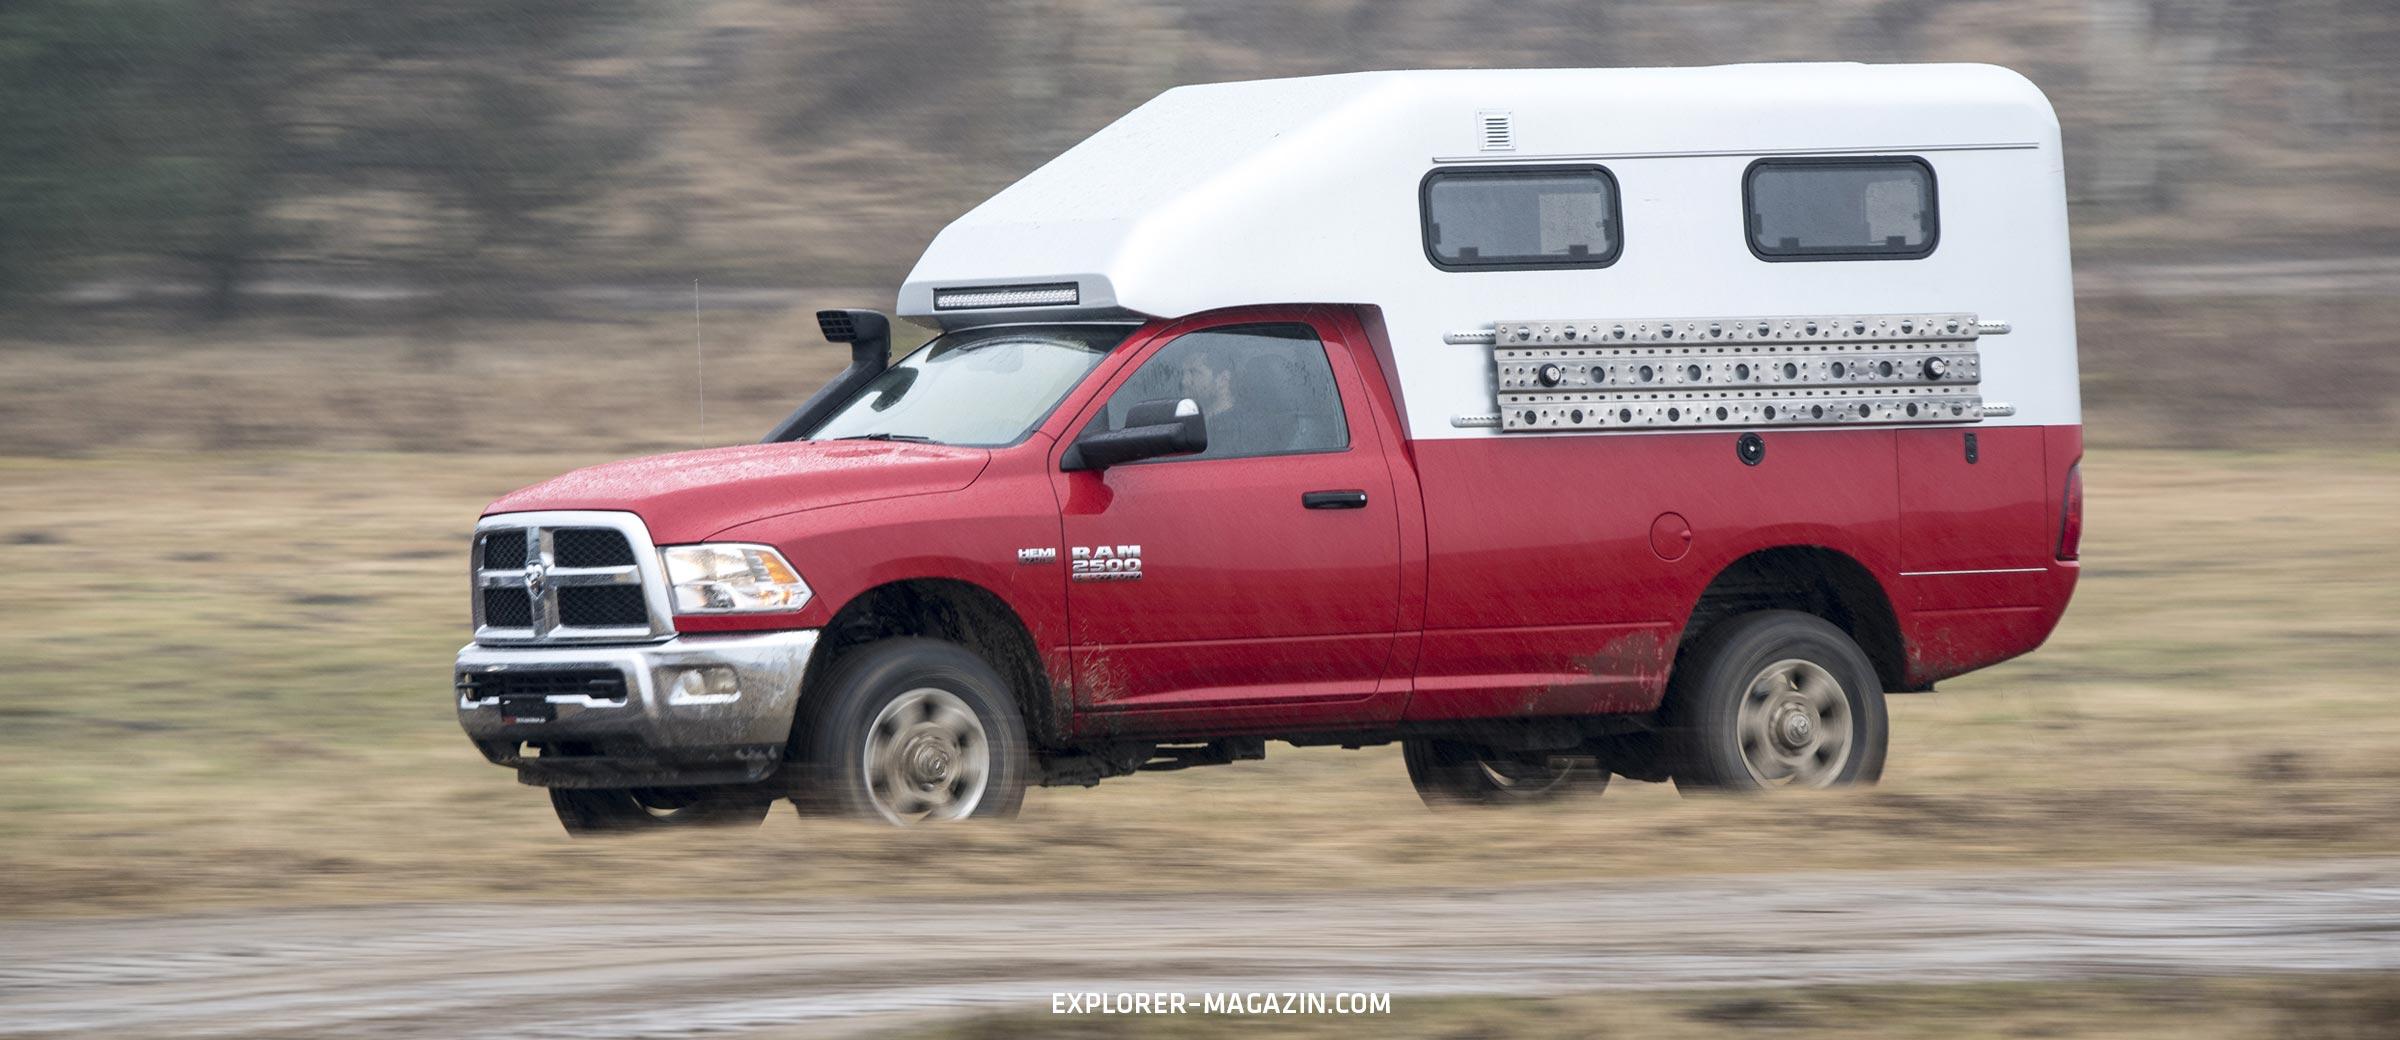 Dodge RAM 2500 Offroad Camper aus Carbon - Leichtbau Manufaktur